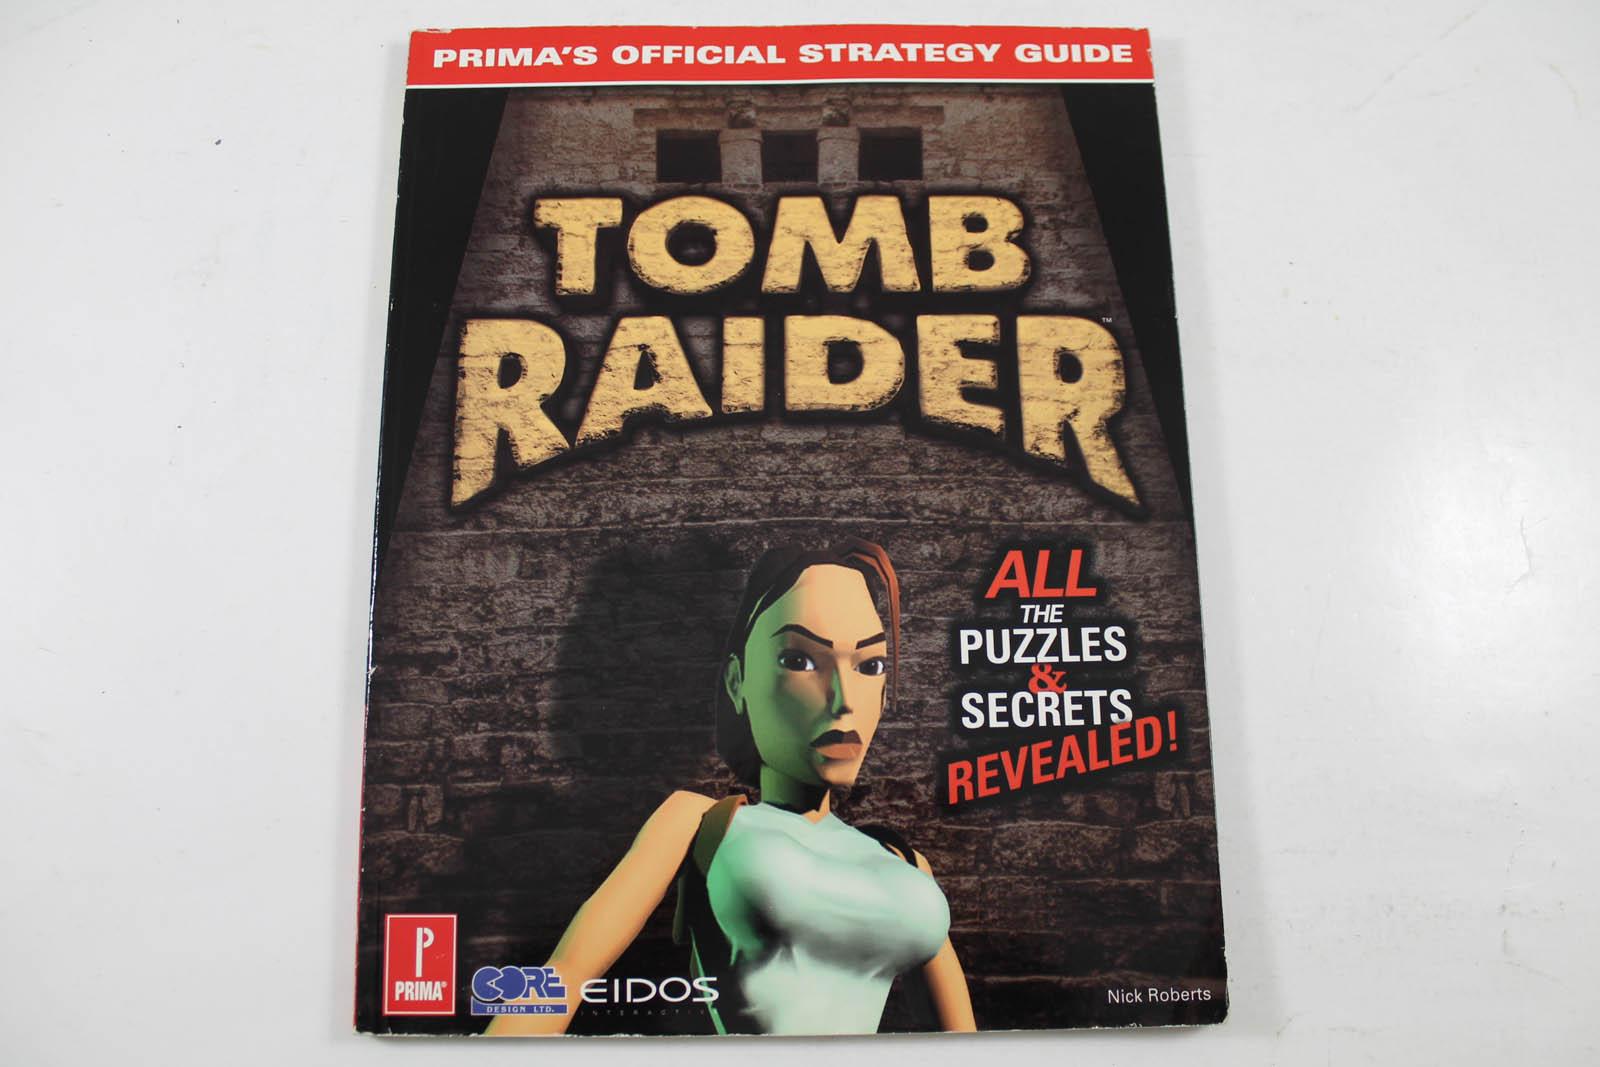 Tomb Raider Secrets